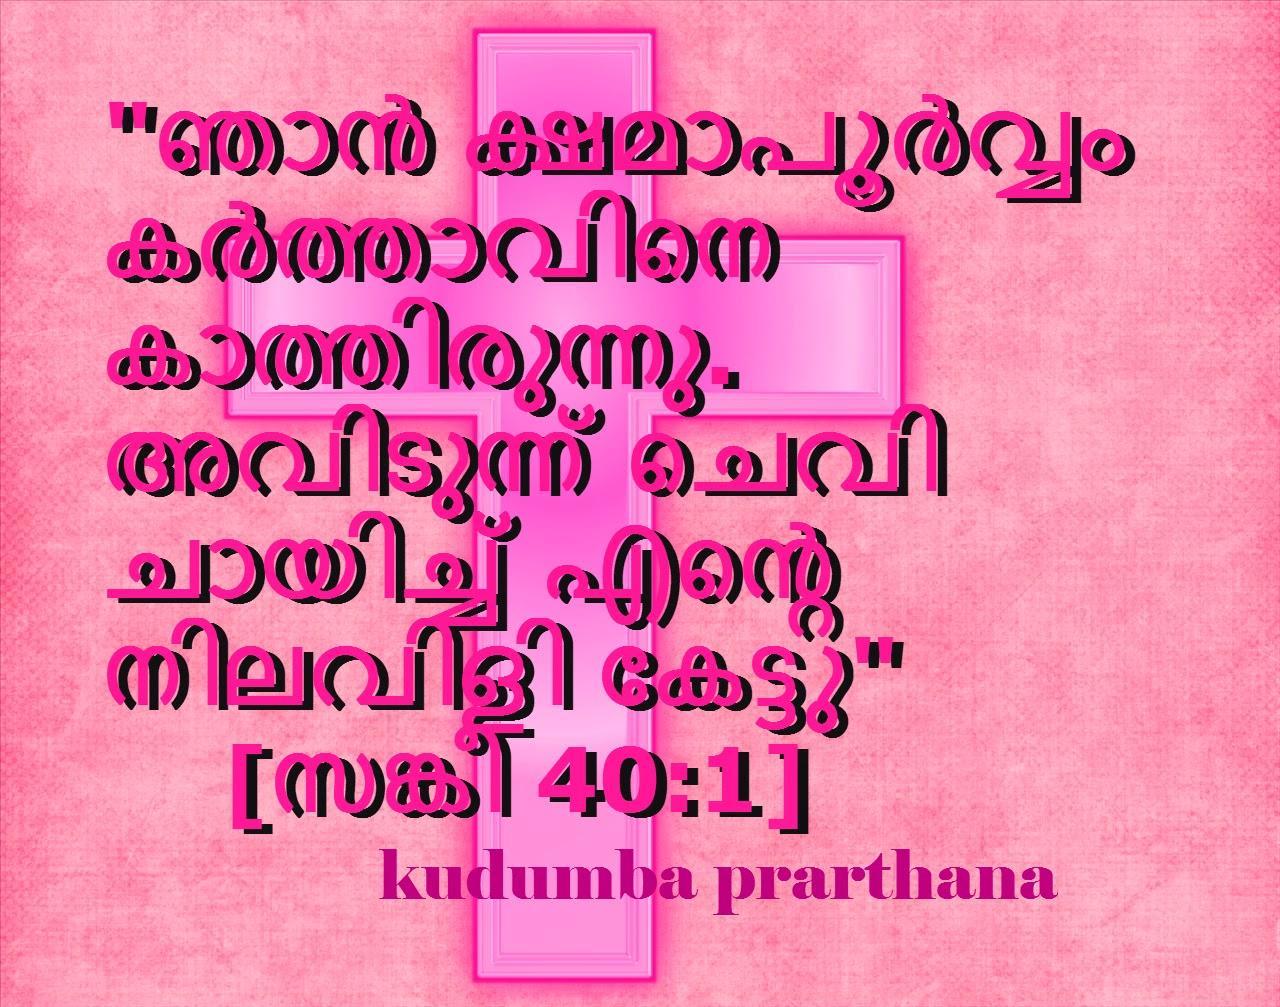 BIBLE VACHANAM: Sankeerthanam 40:1